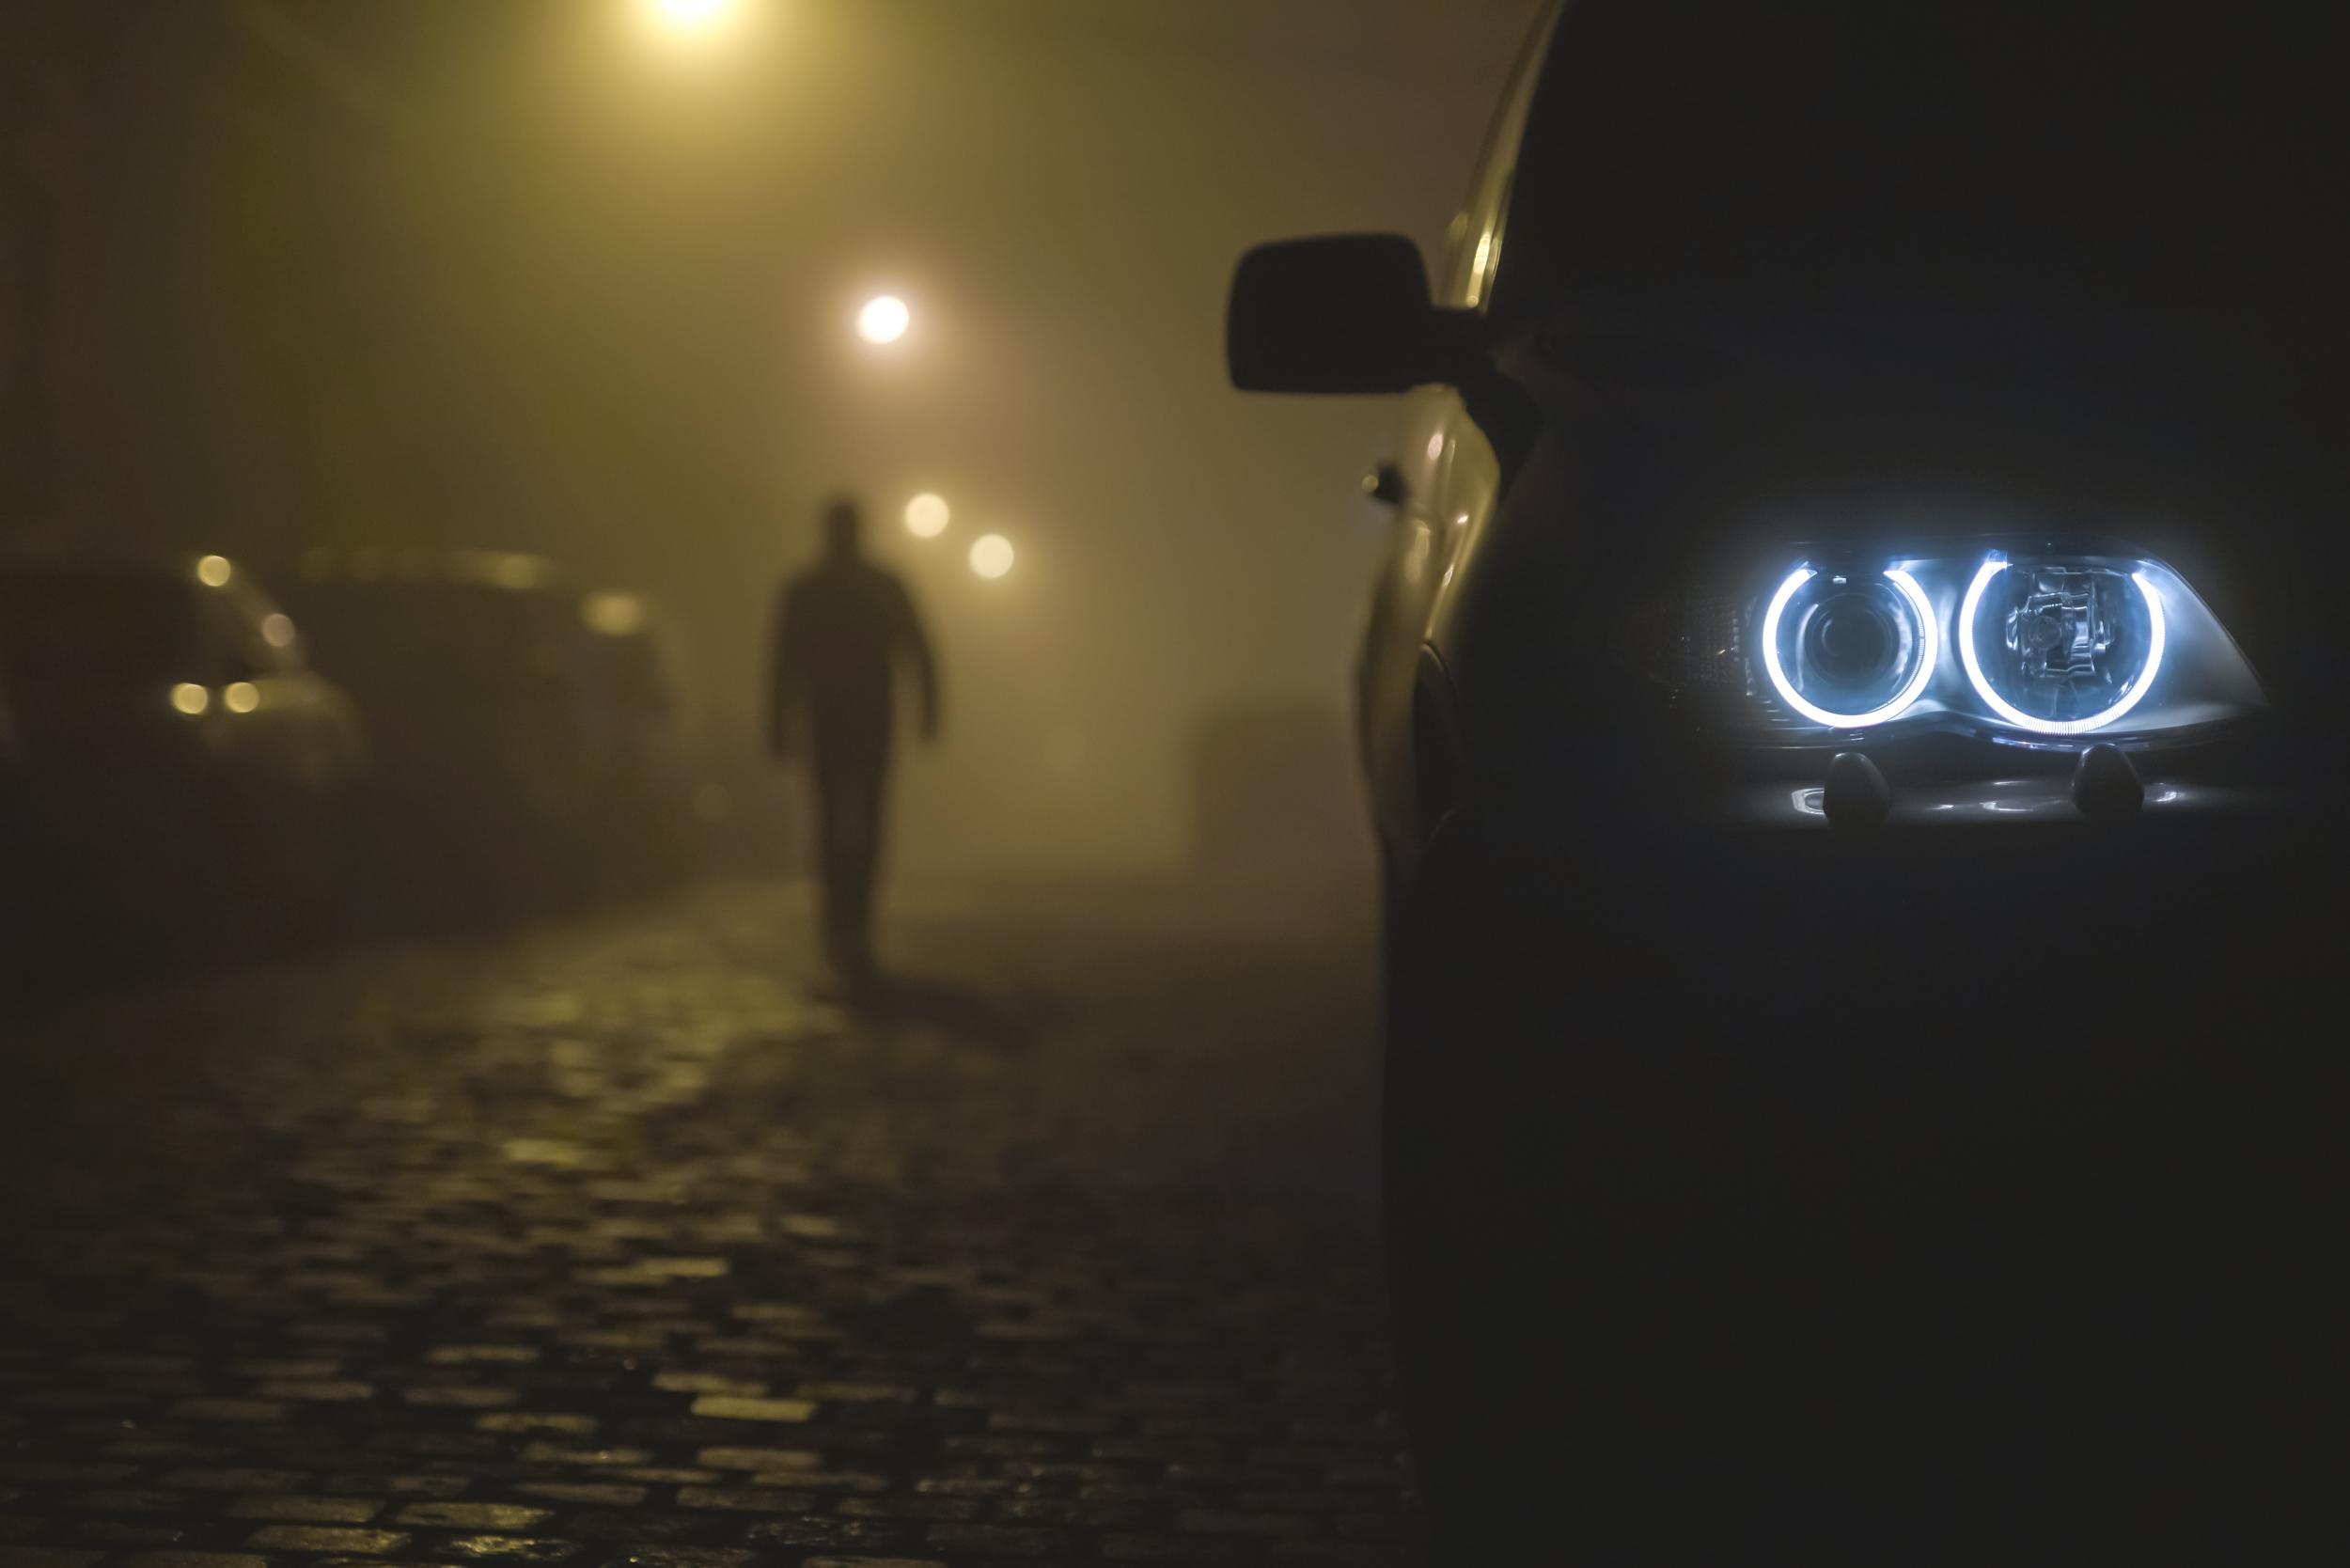 Car LED Headlight Night BMW Dark Street City Men Mist Blue 2500x1668